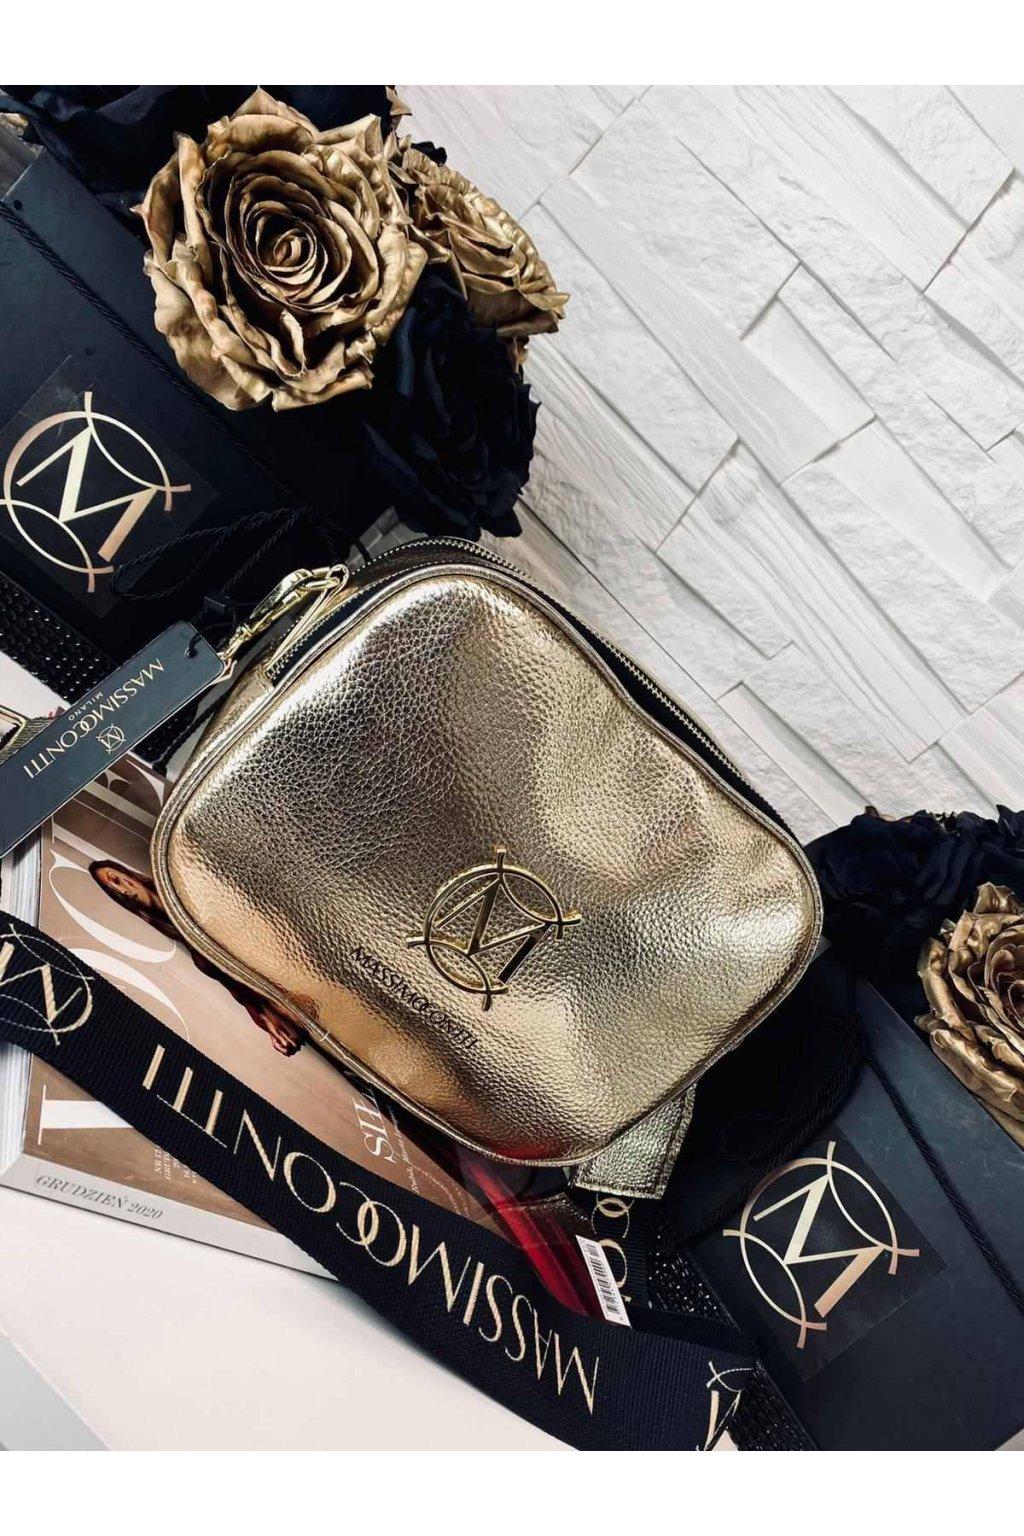 kabelka CROSSBODY massimo contti styl italy eko kůže koženka eleganto zlatá barva